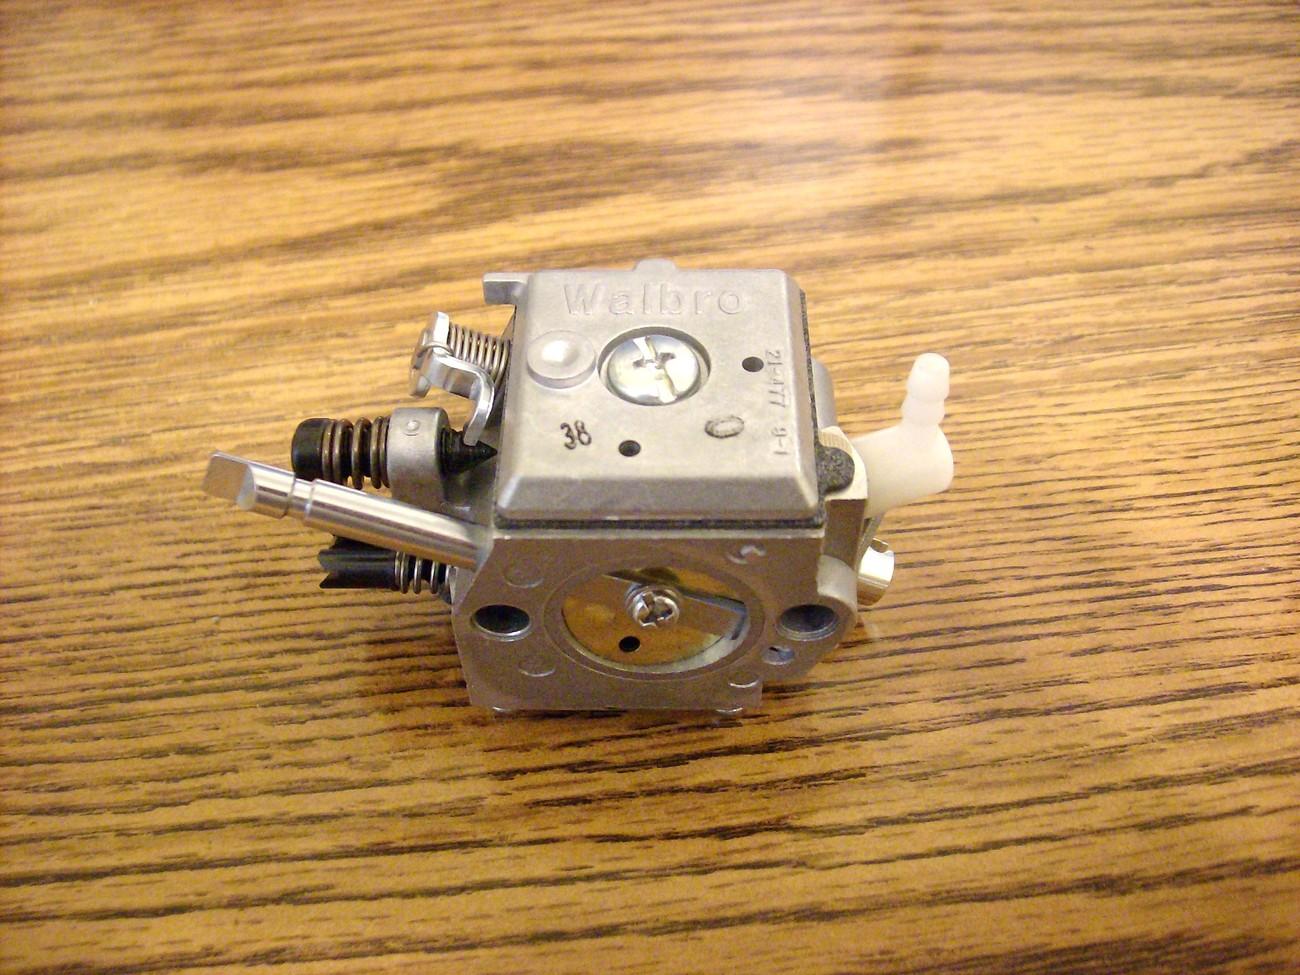 Fits Stihl BR400 backpack leaf blower Walbro carburetor HD4, HD41